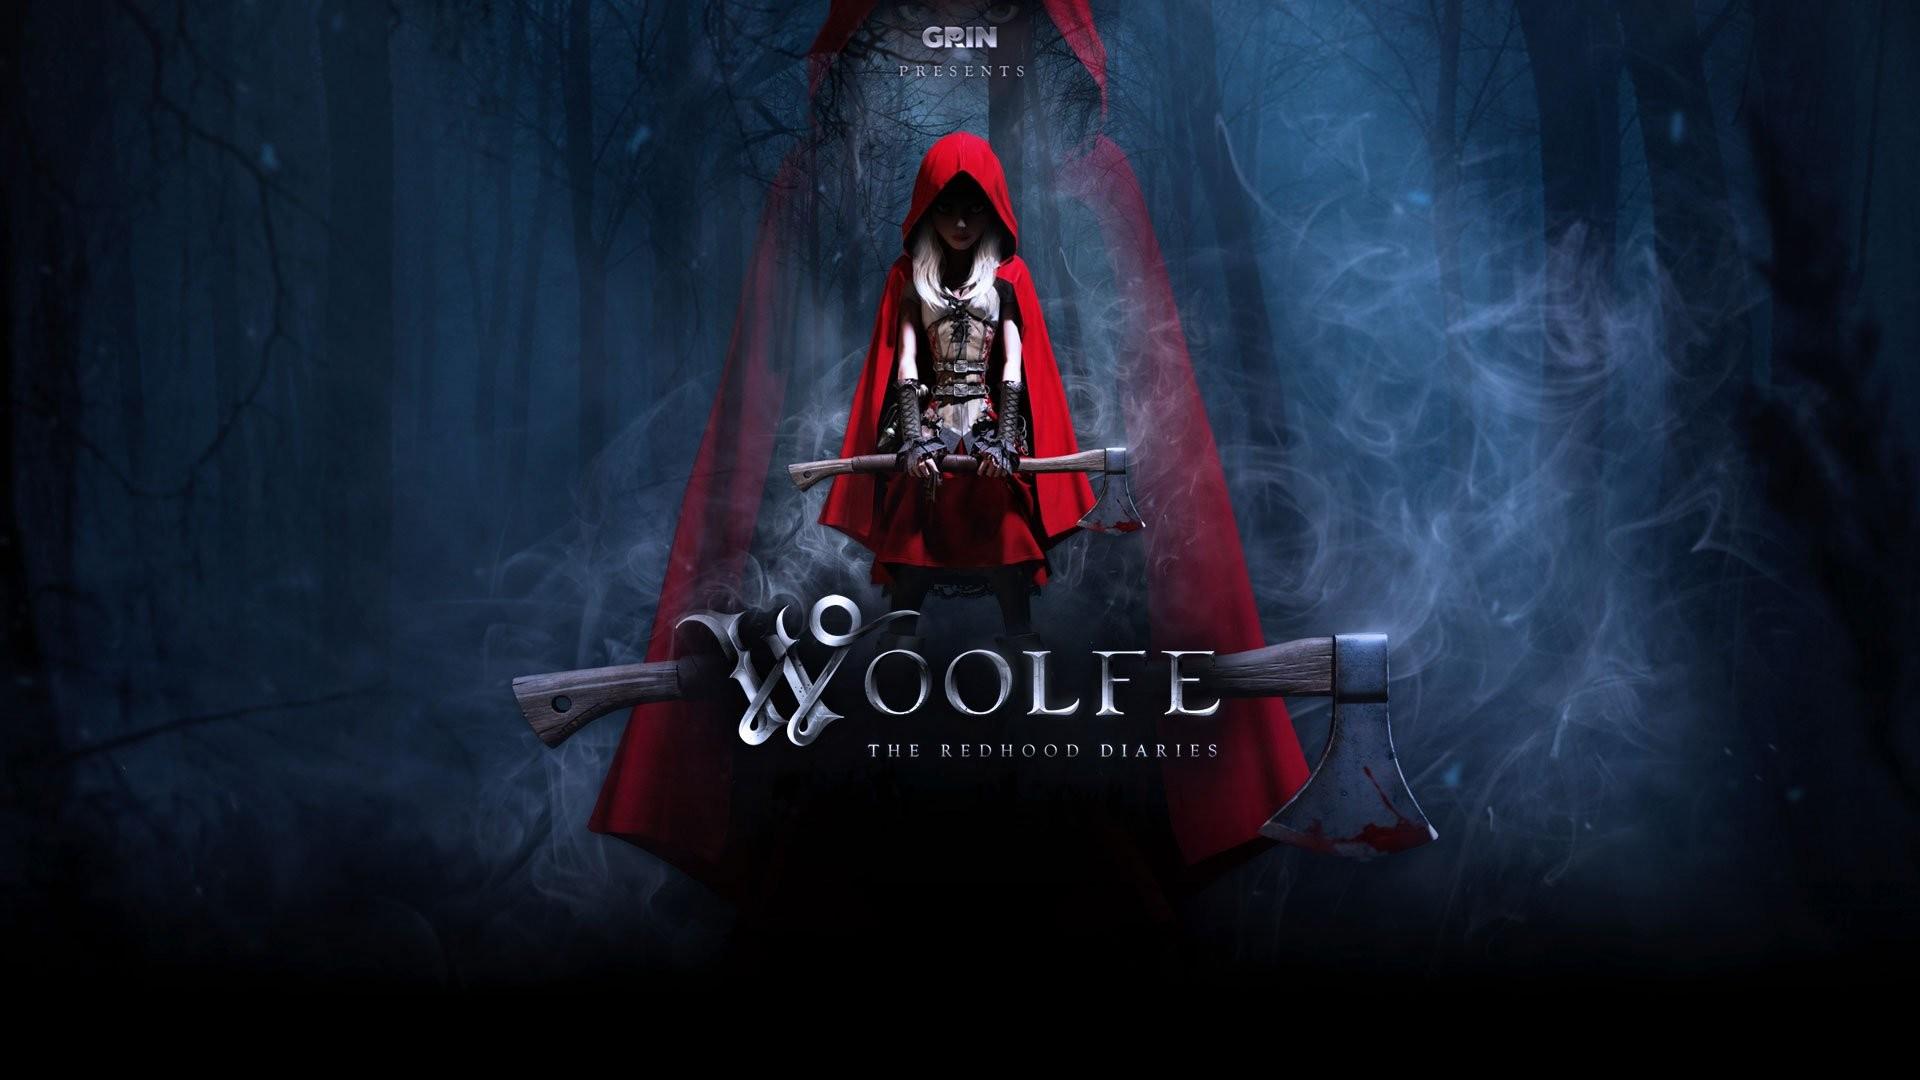 WOOLFE RED HOOD DIARIES platform fantasy fairytale steampunk action  wallpaper | | 396967 | WallpaperUP